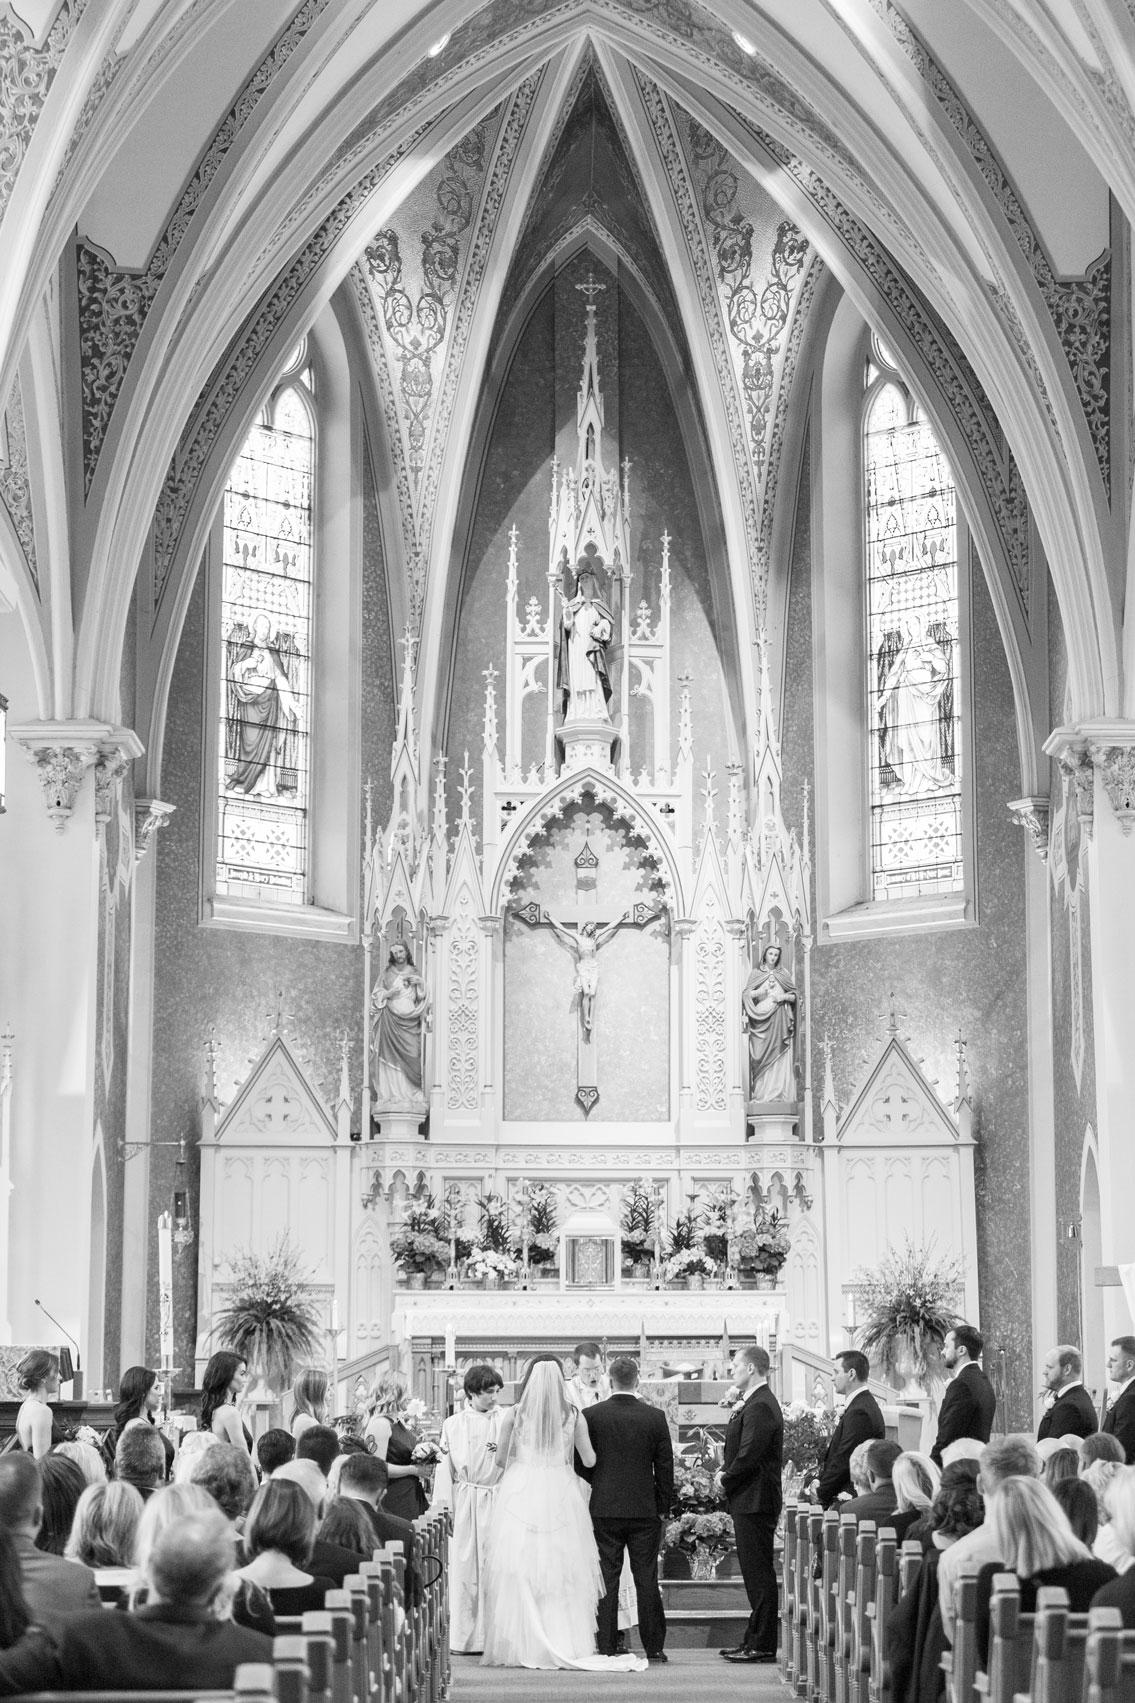 Konz-Bigaila-wedding-2017-43.jpg